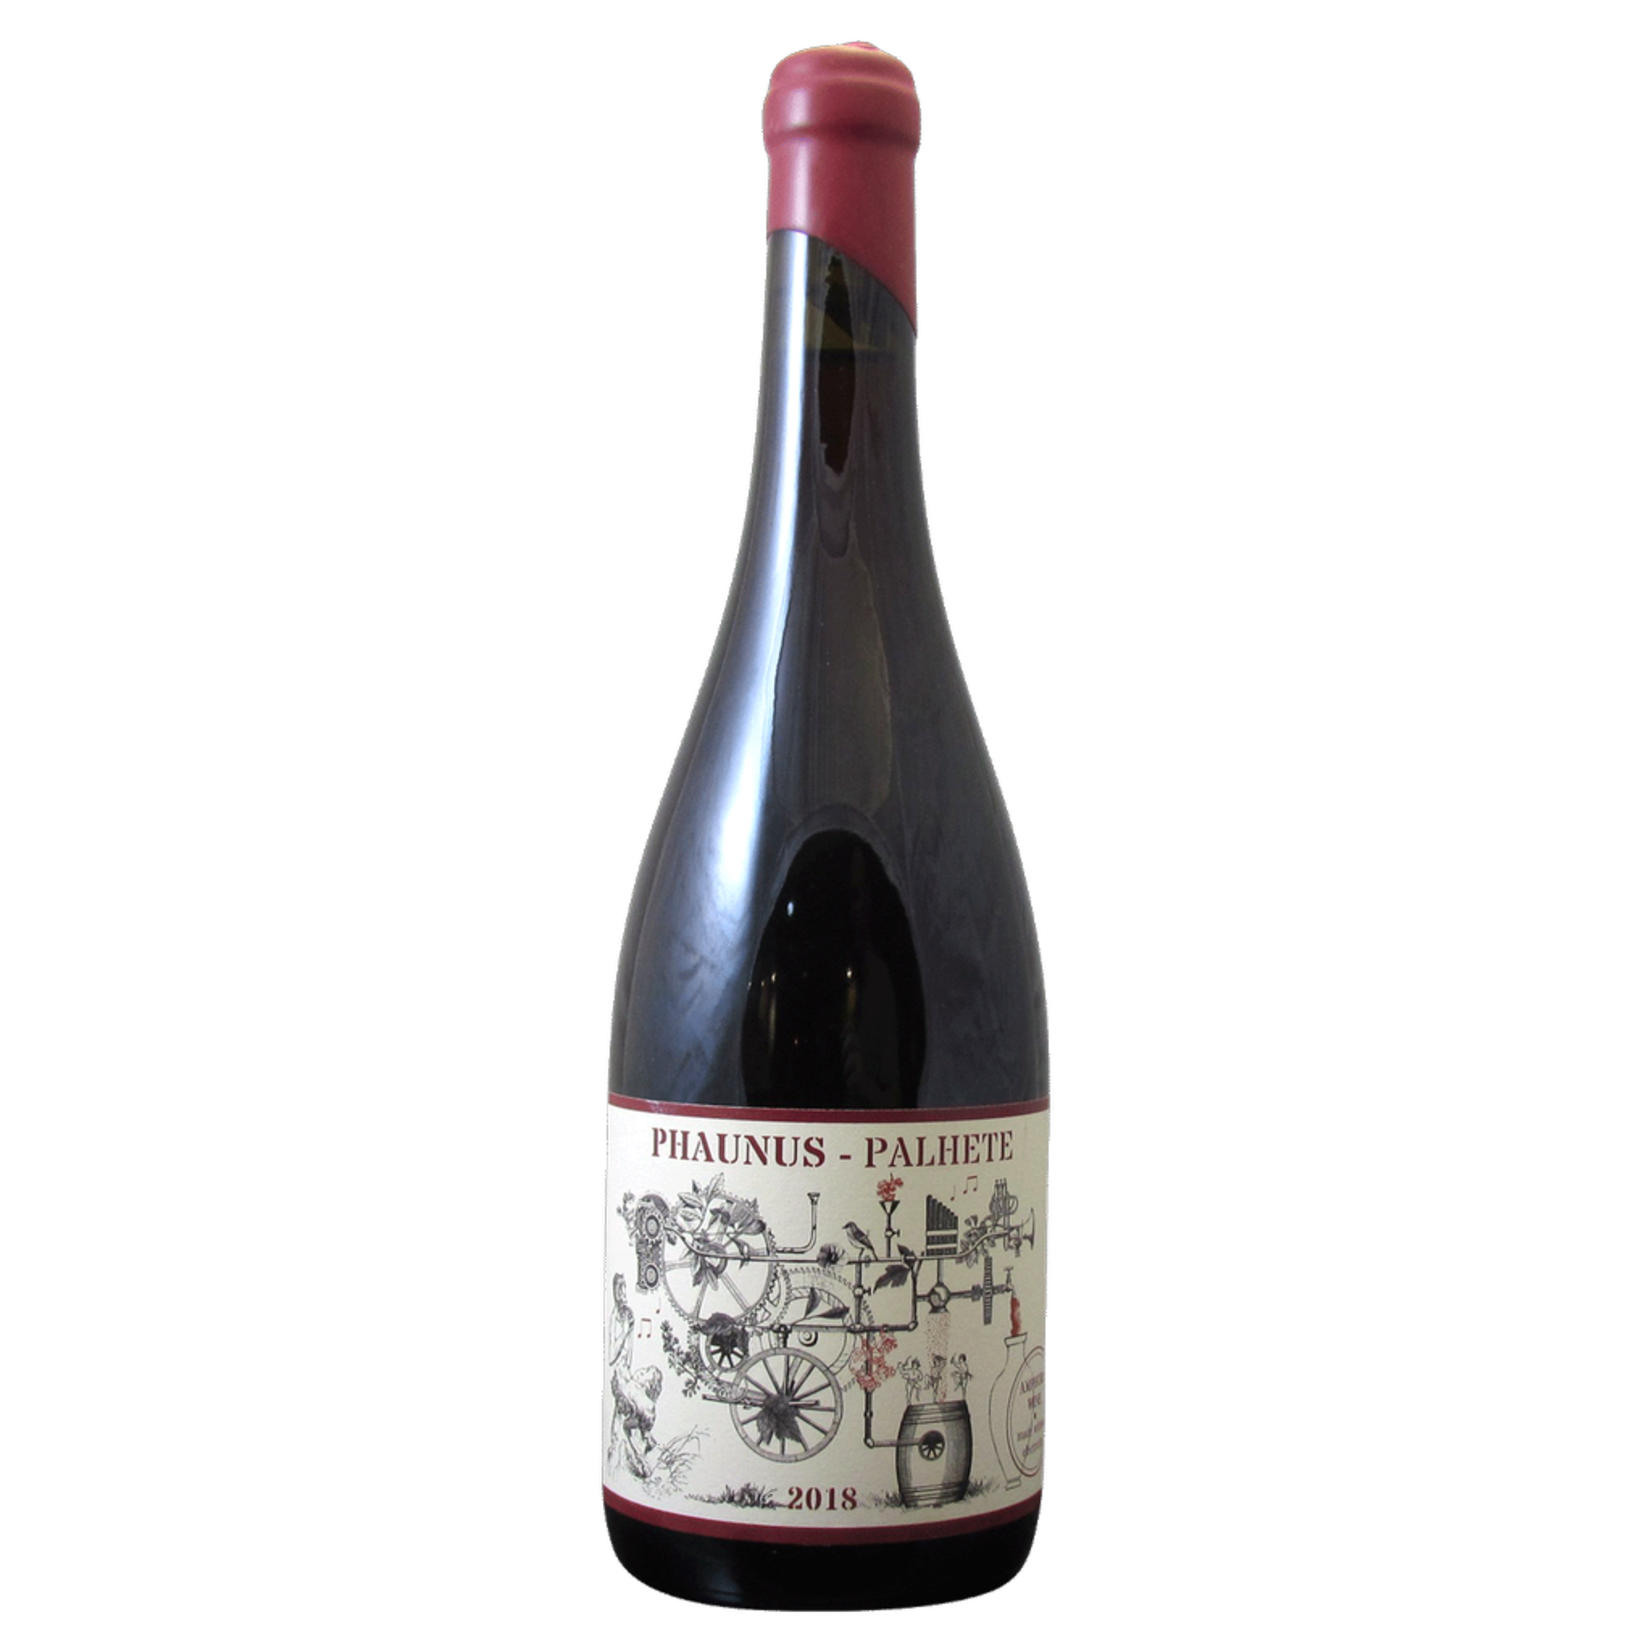 Wine Aphros Vinho Verde Phaunus Palhete Amphora 2018